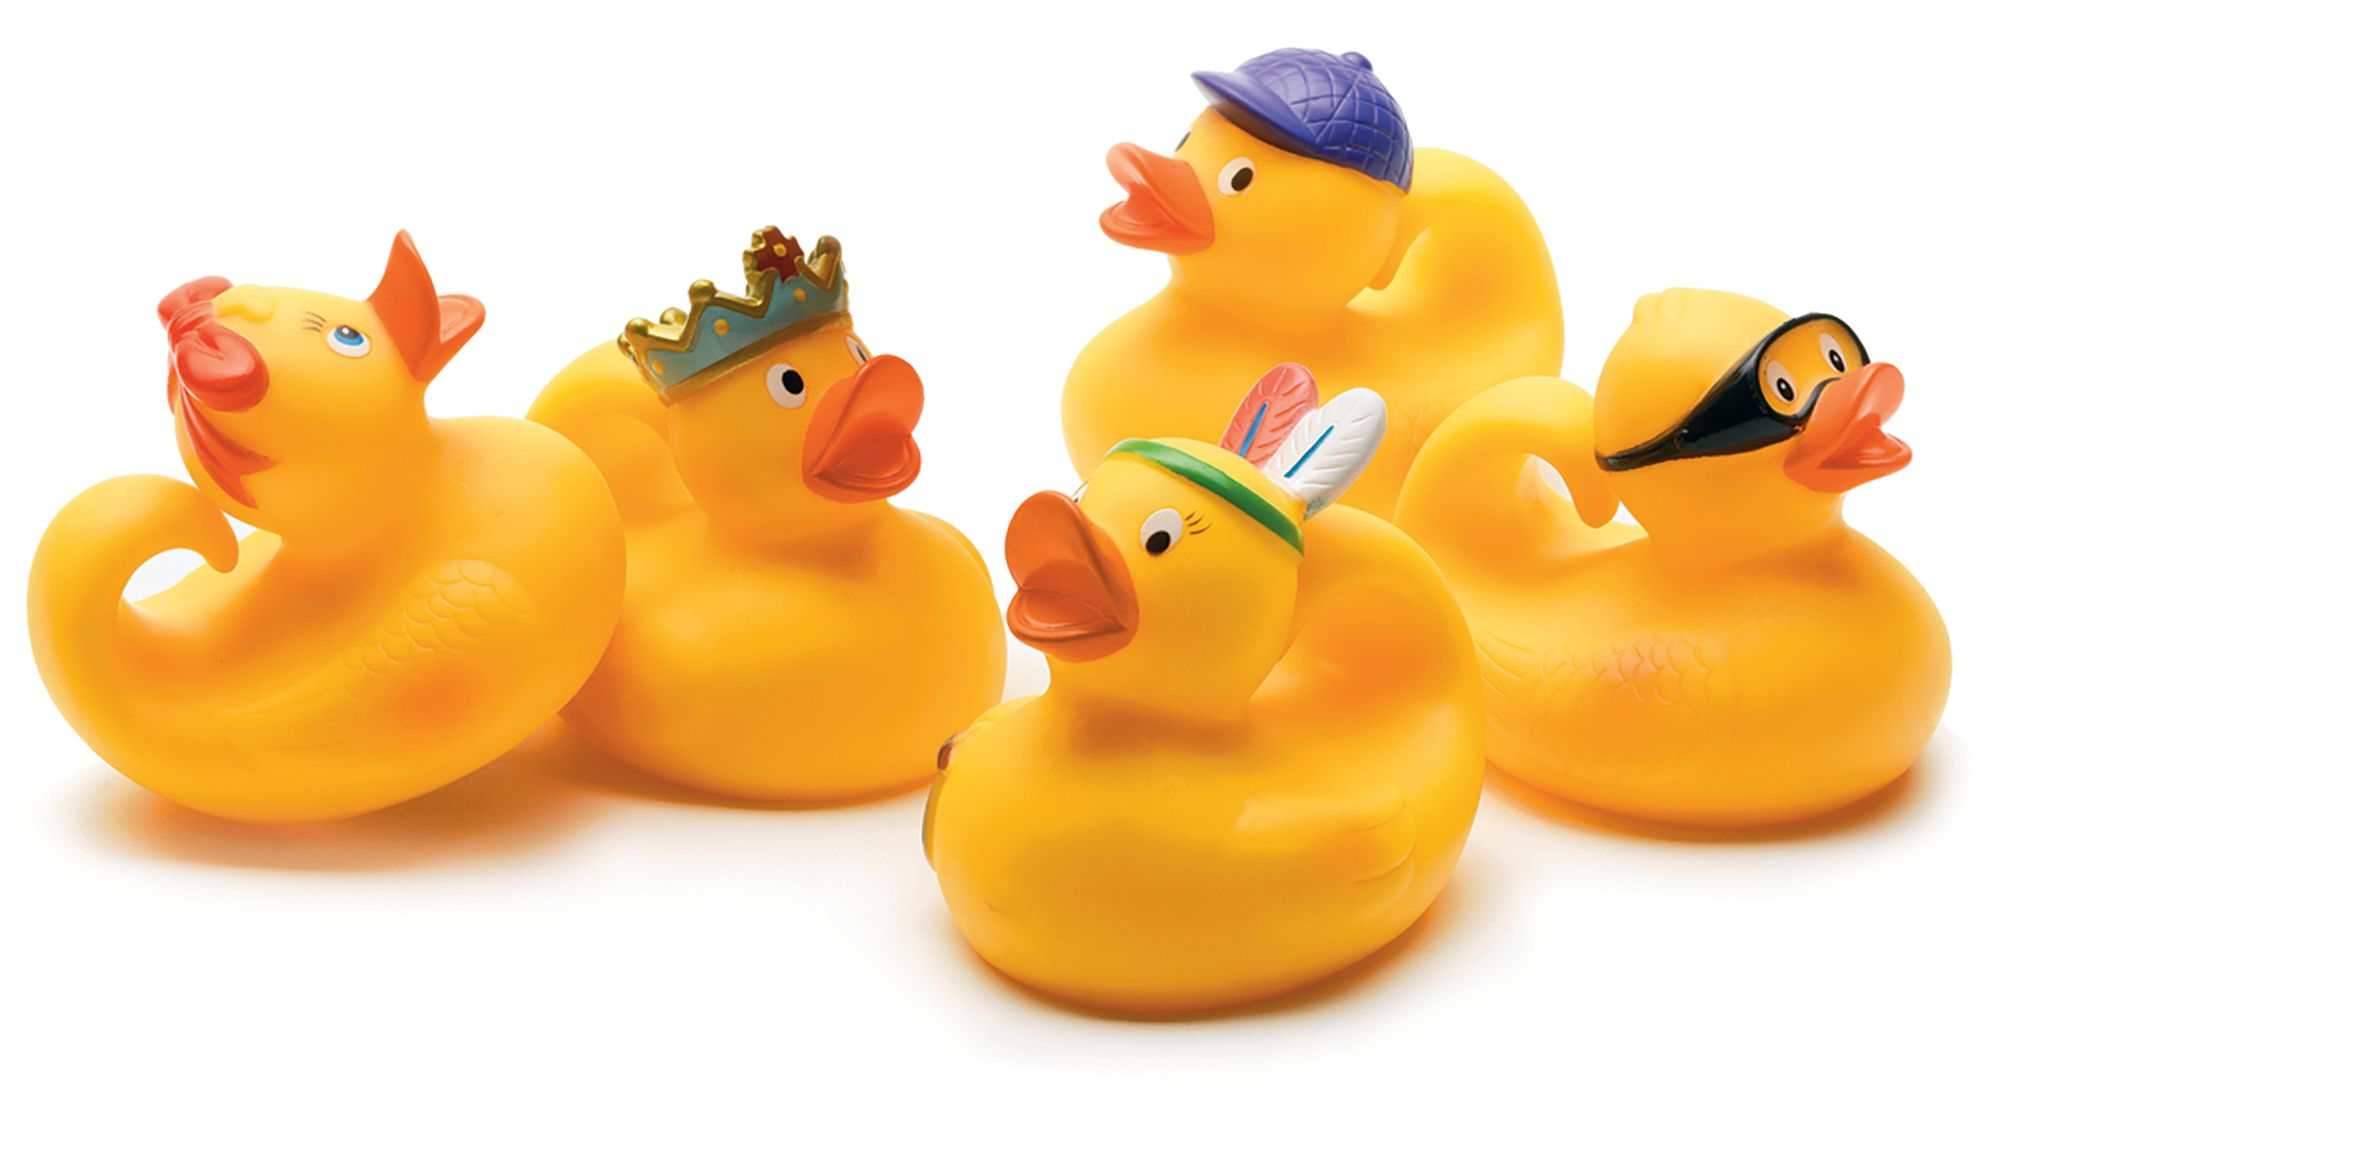 Fishing Ducks Game